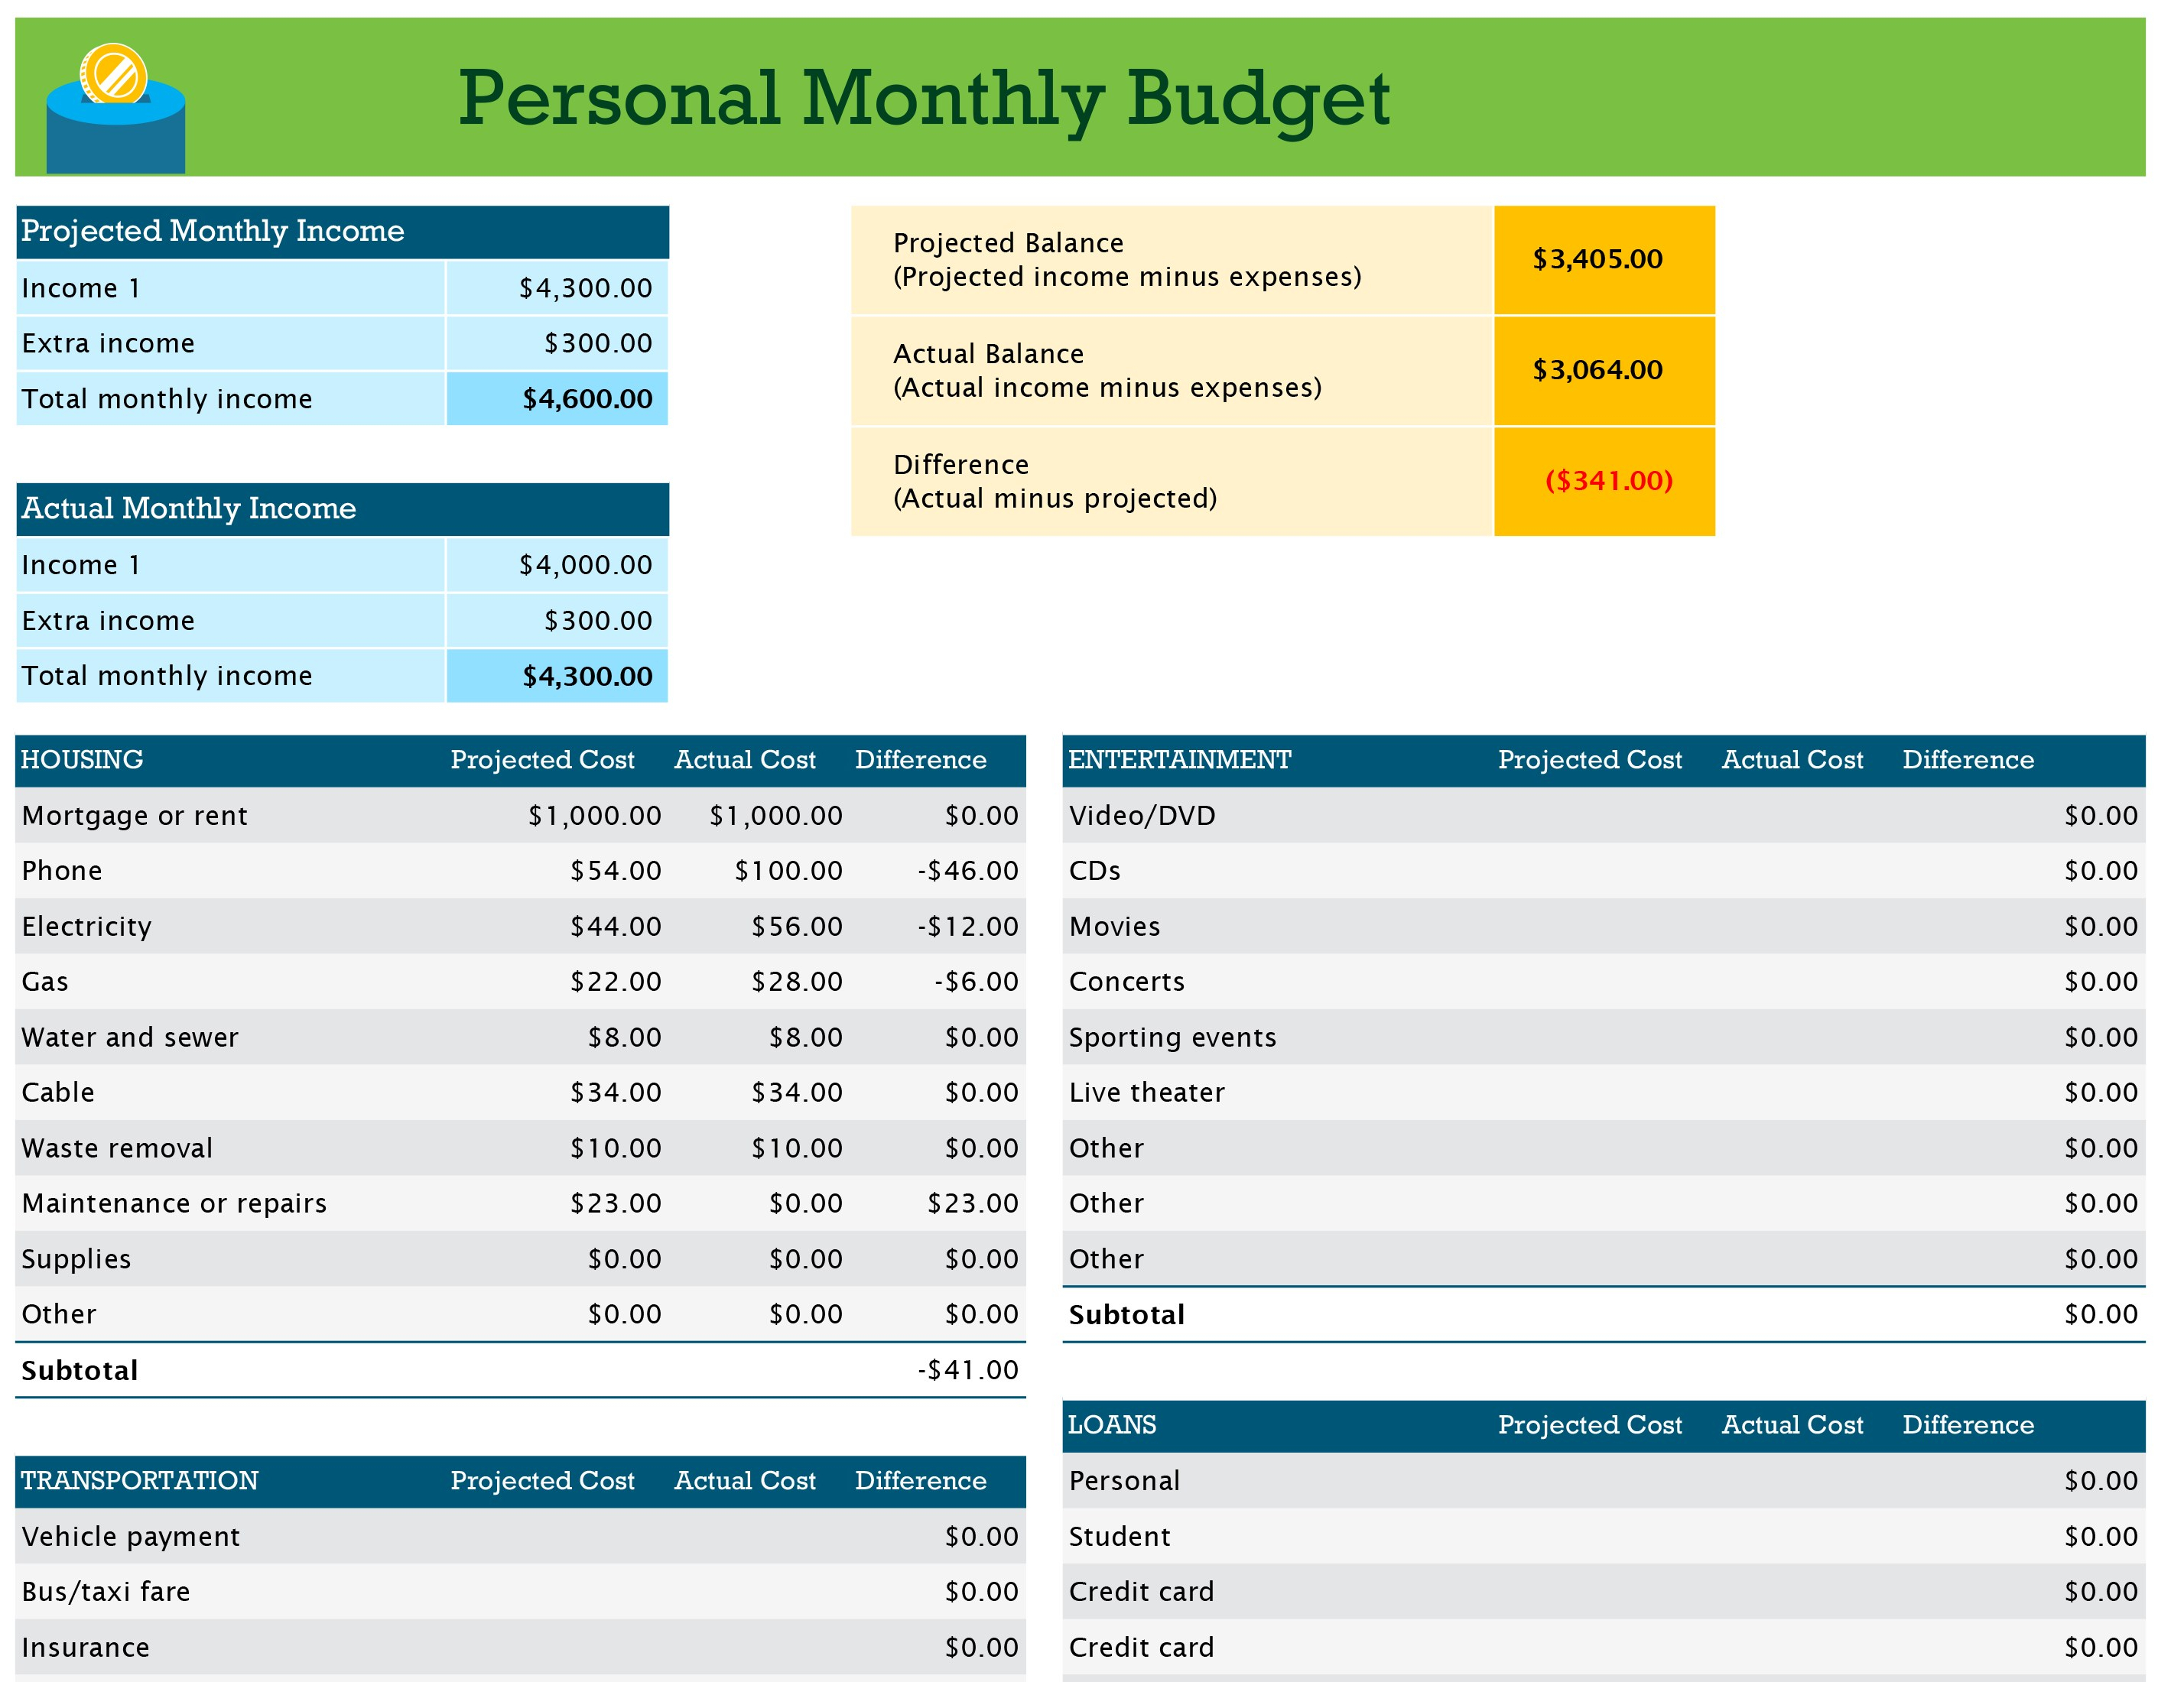 Annual Family Budget Spreadsheet Spreadsheet Downloa Annual Family Budget Spreadsheet Annual